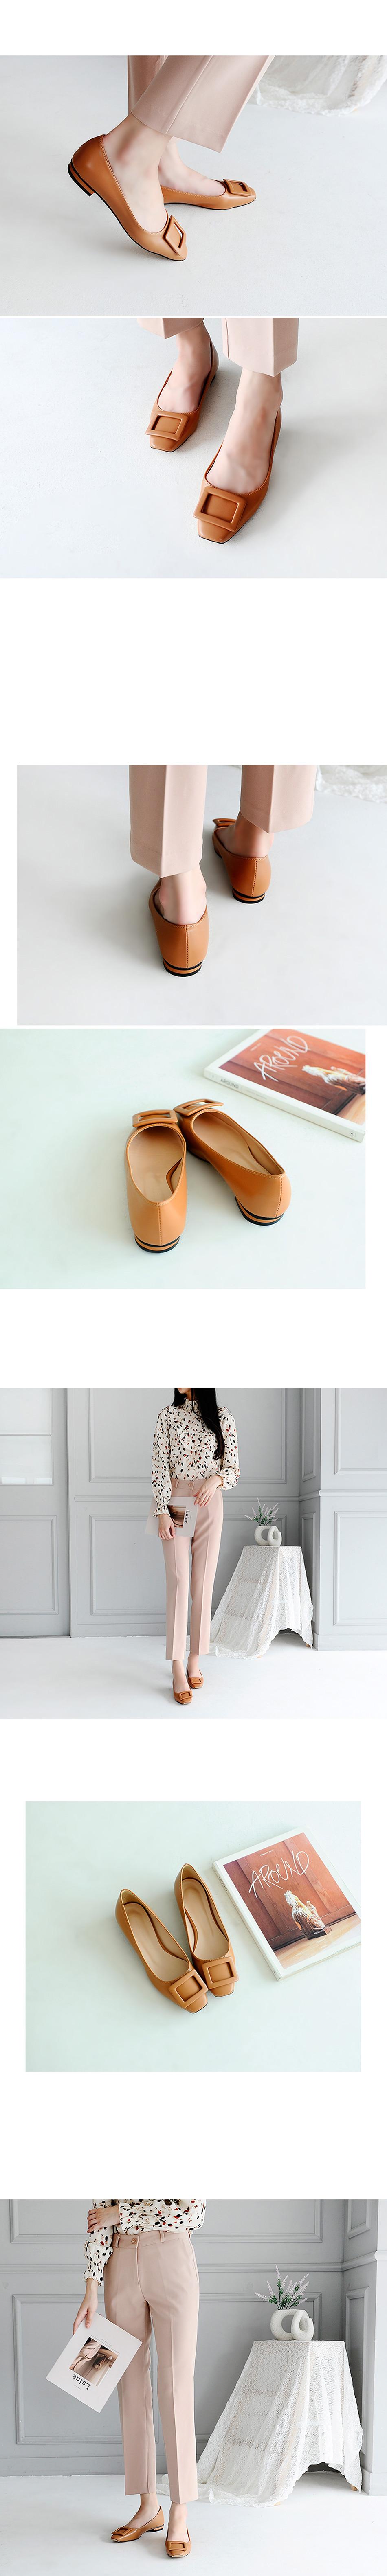 Florence Flat Shoes 1cm